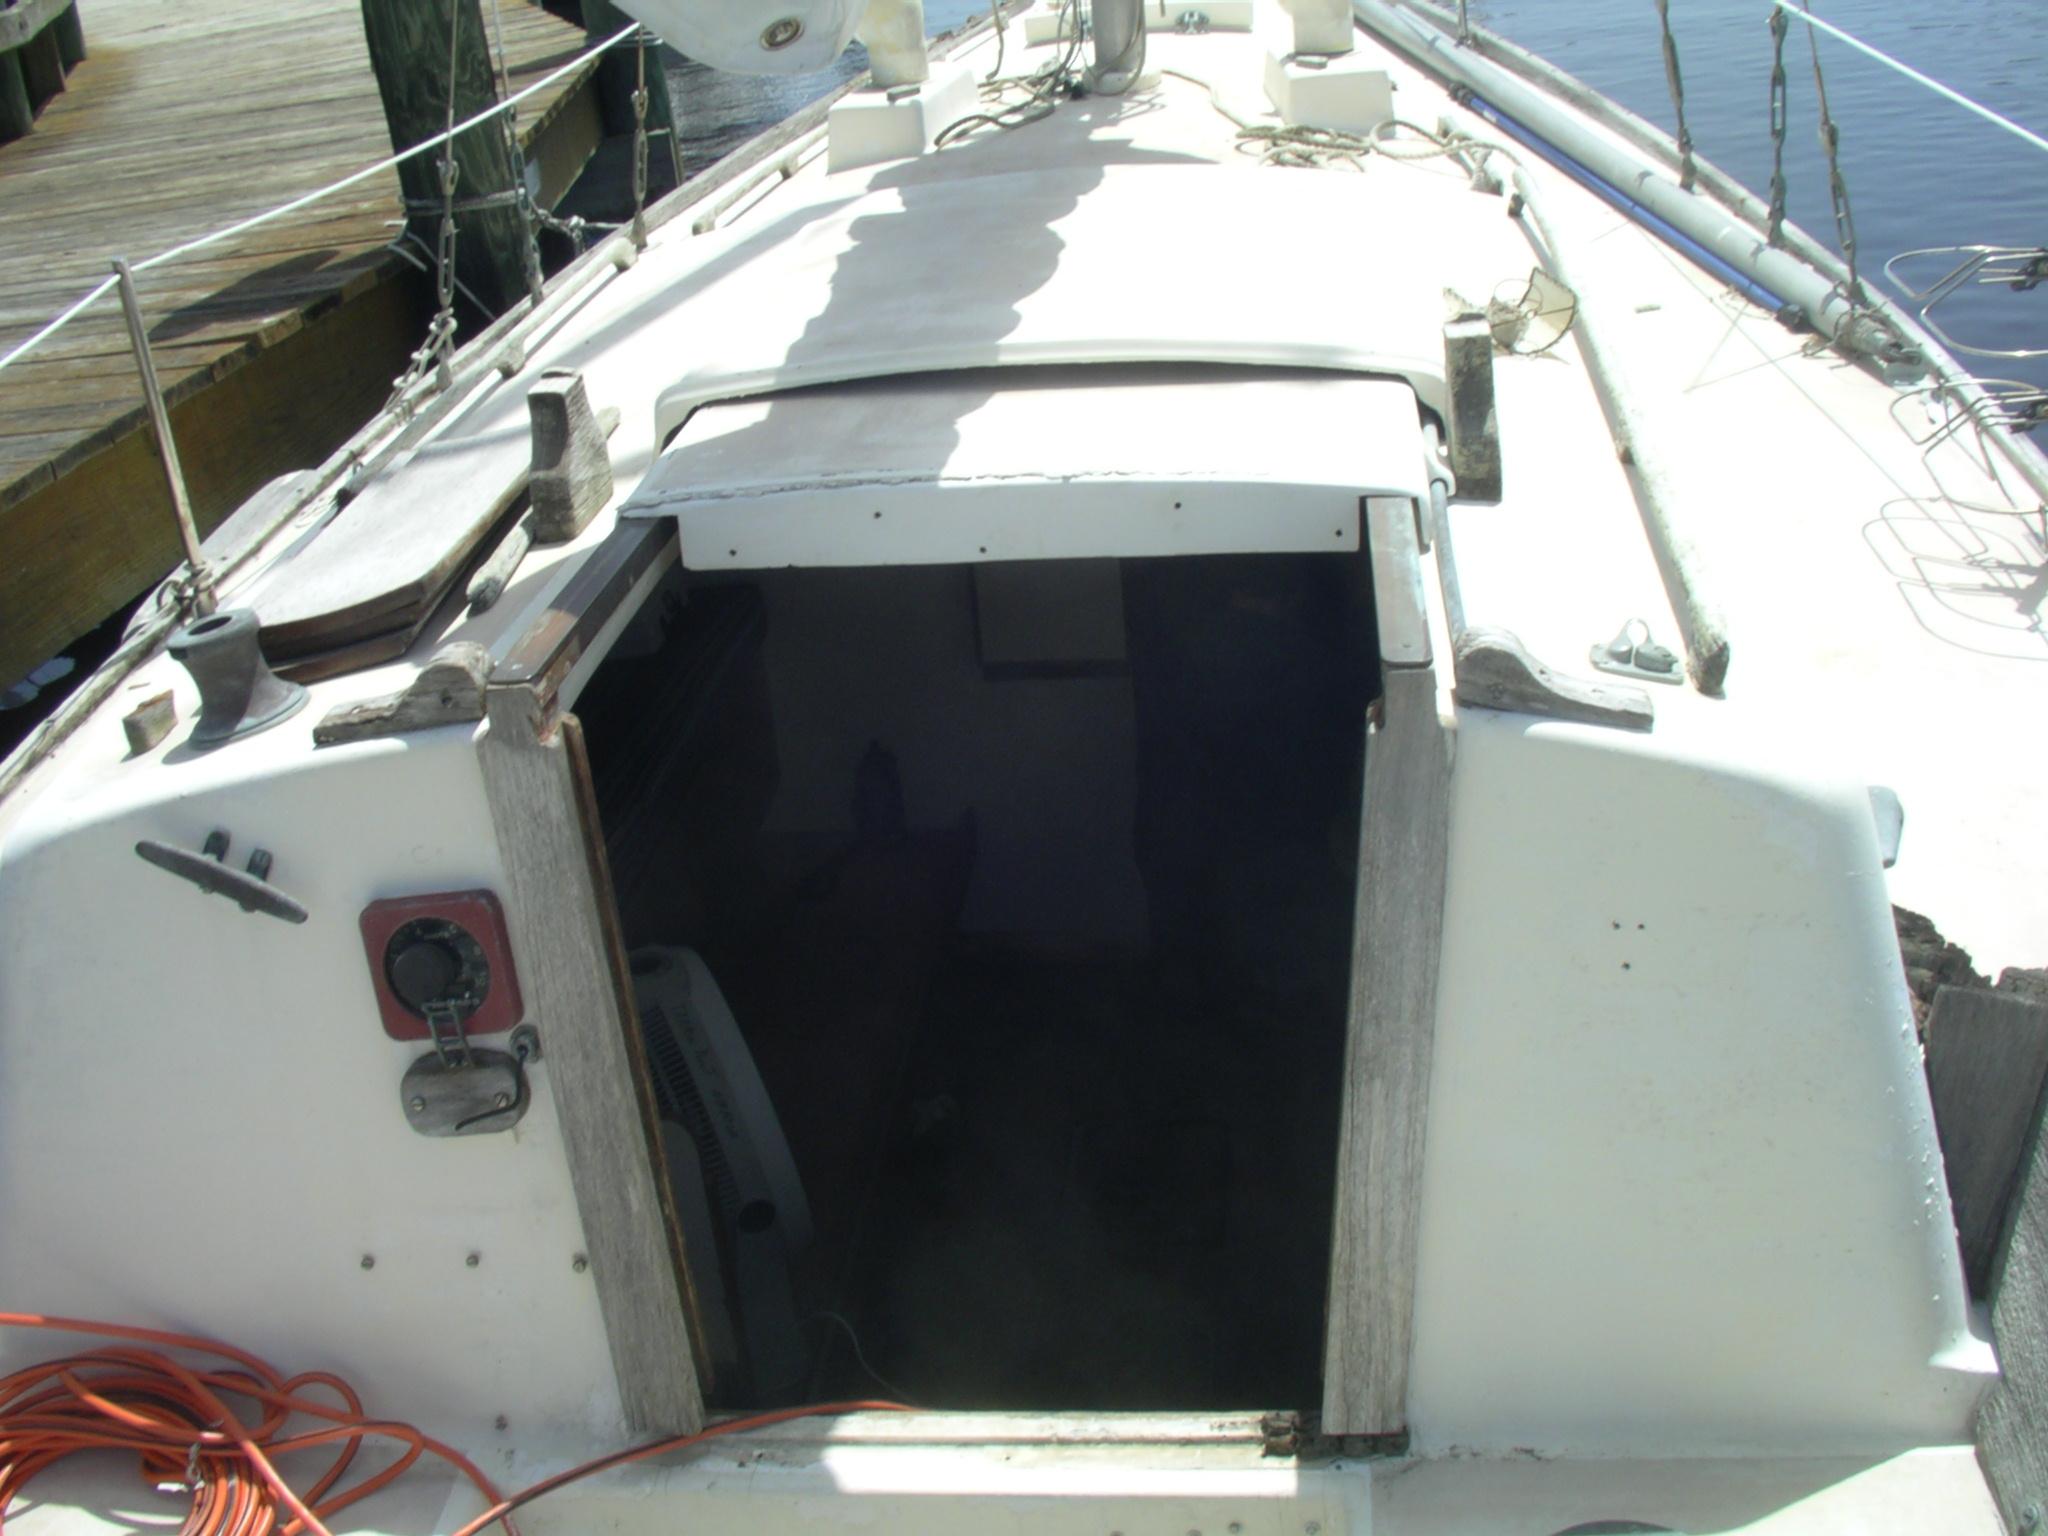 BoatDeck_July2010 (6).JPG